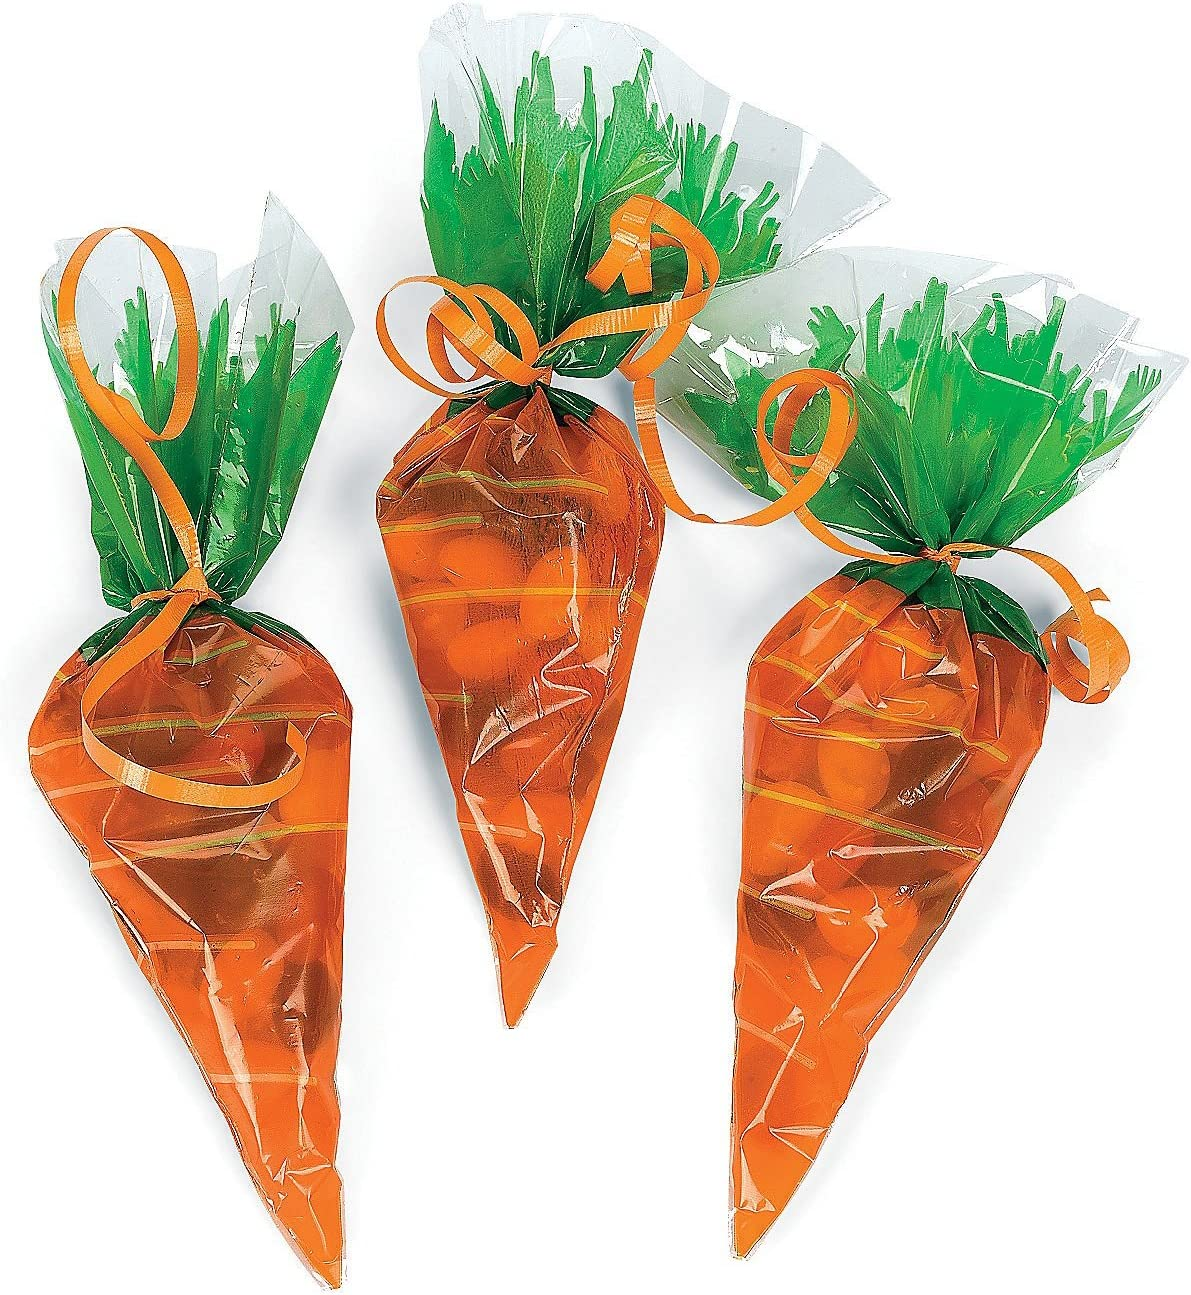 Amazon Com Cellophane Carrot Shaped Goody Bags 1 Dozen Home Kitchen